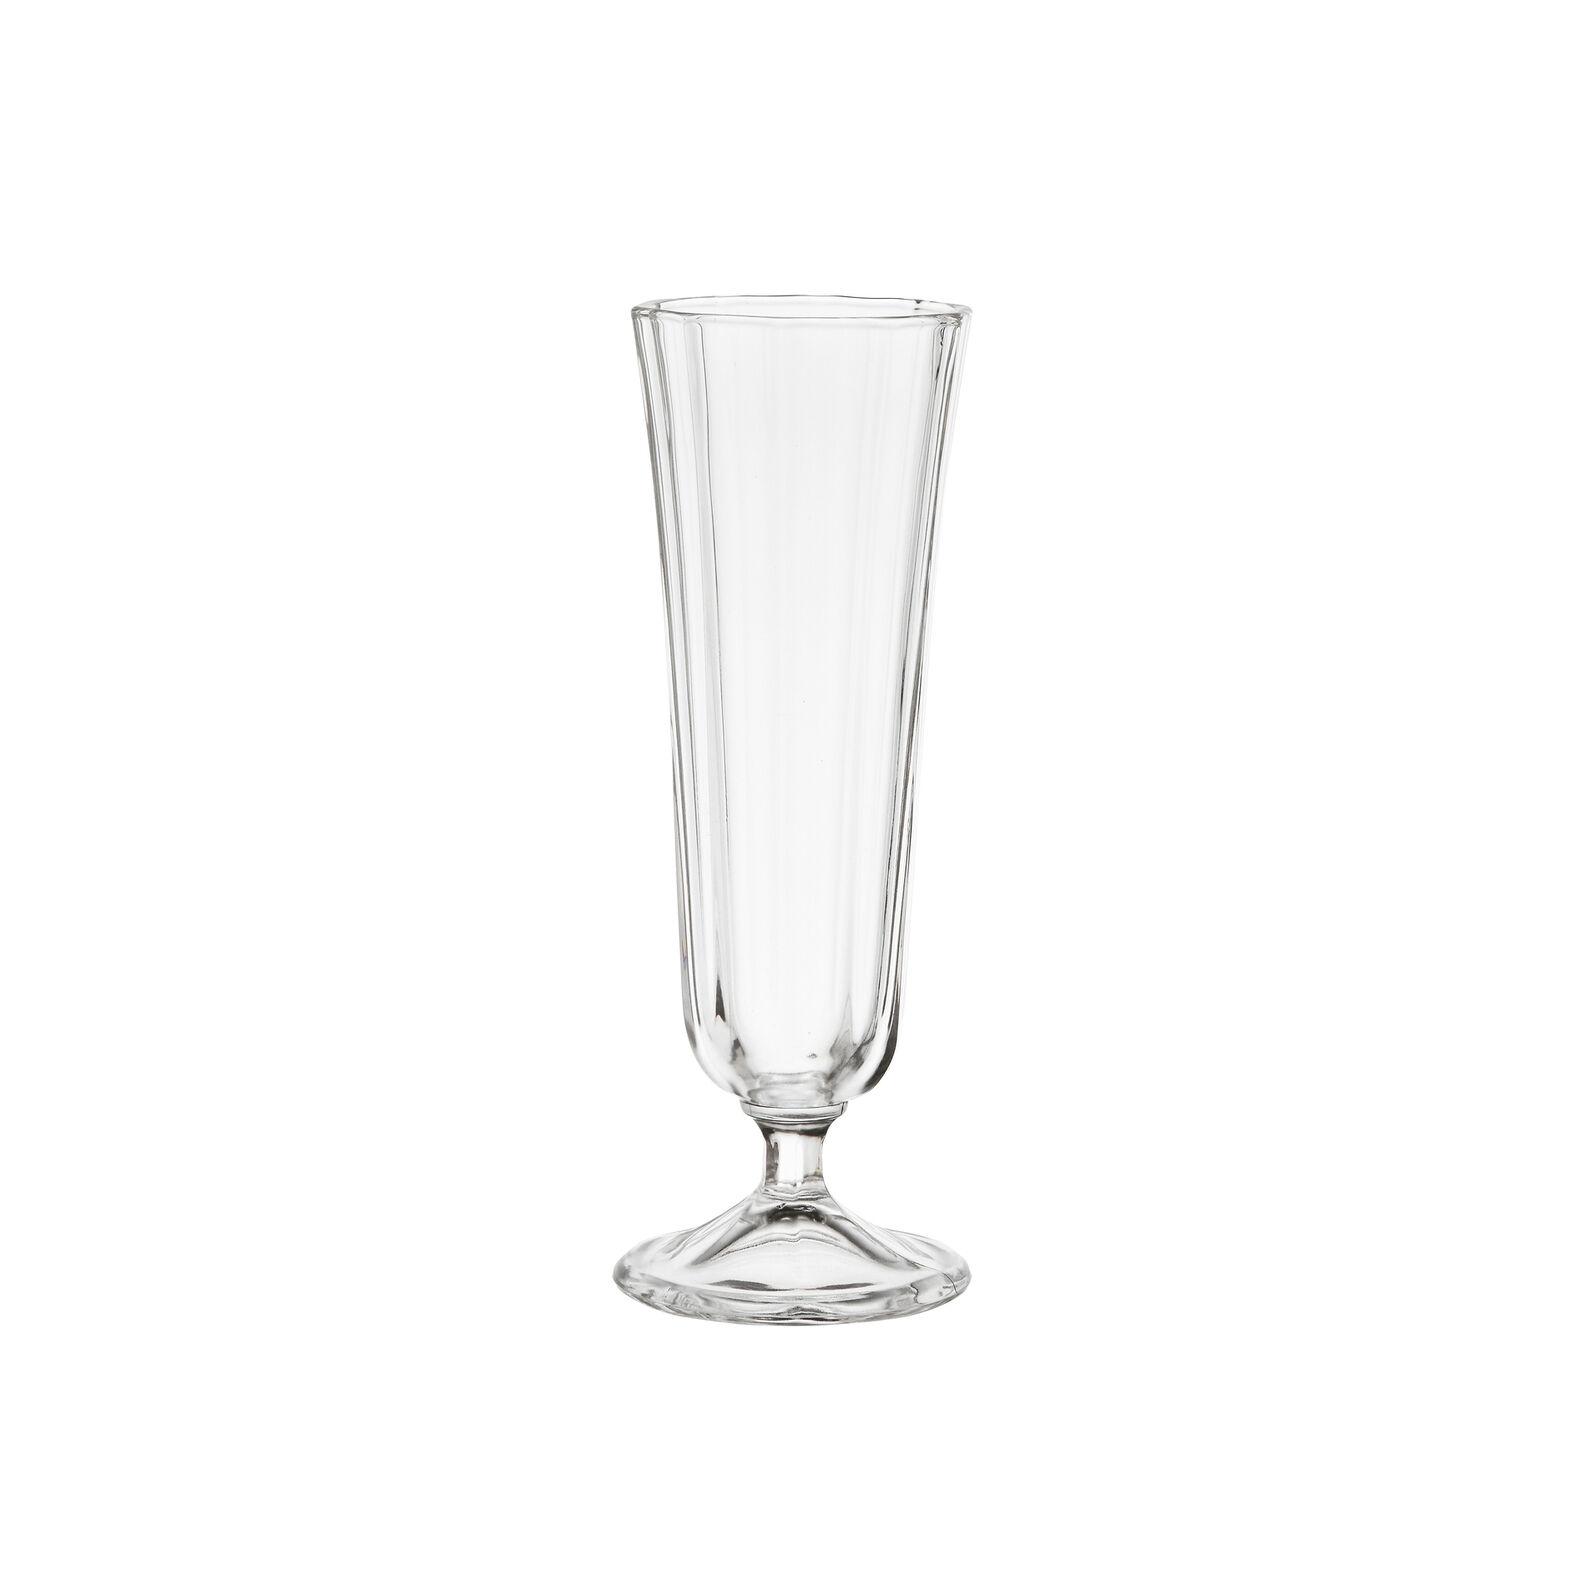 Flute goblet